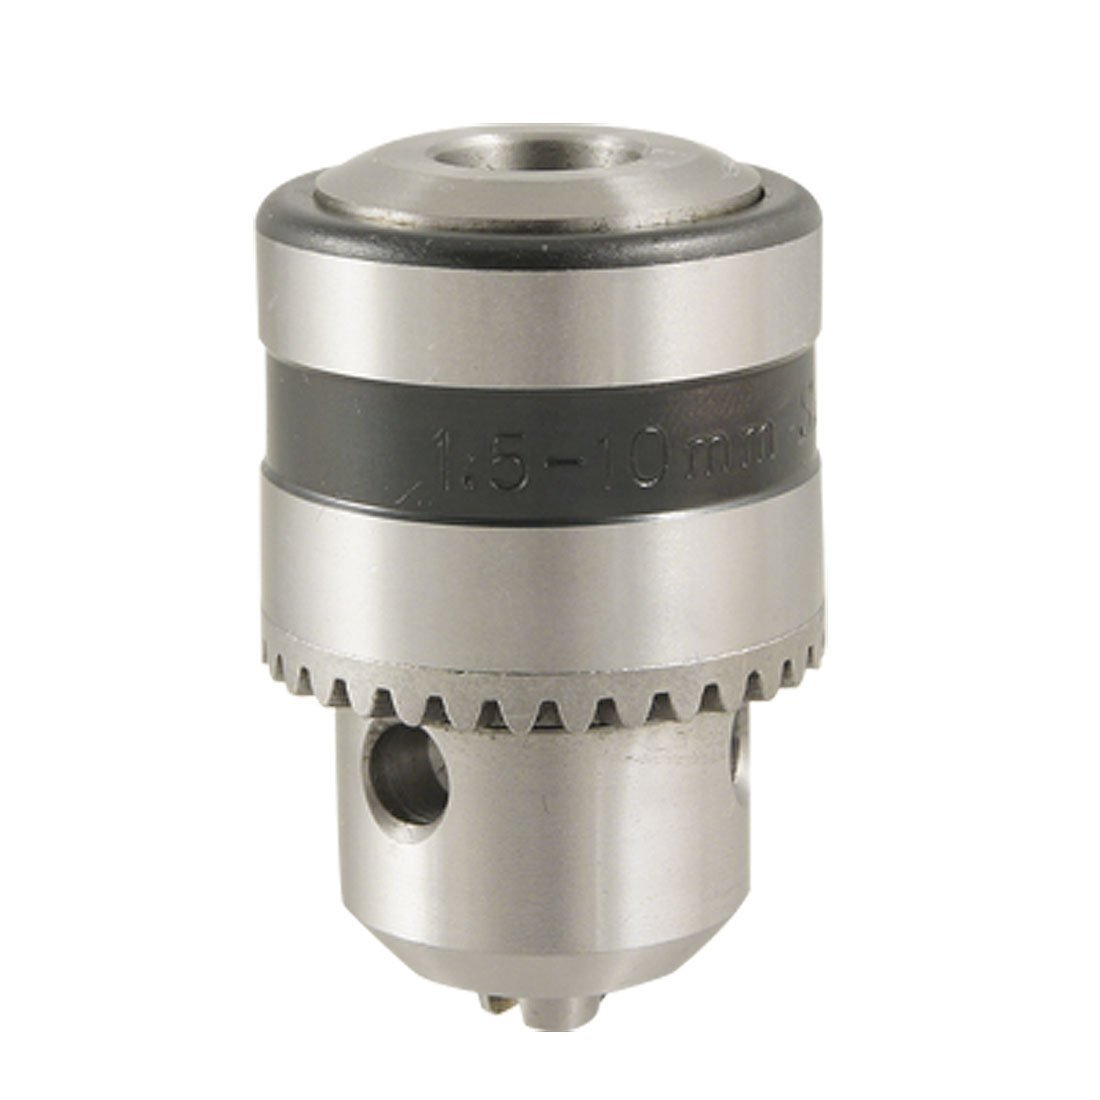 1.5-10mm capacità b12 foro conico mandrino chiave Sourcingmap a11060700ux0178